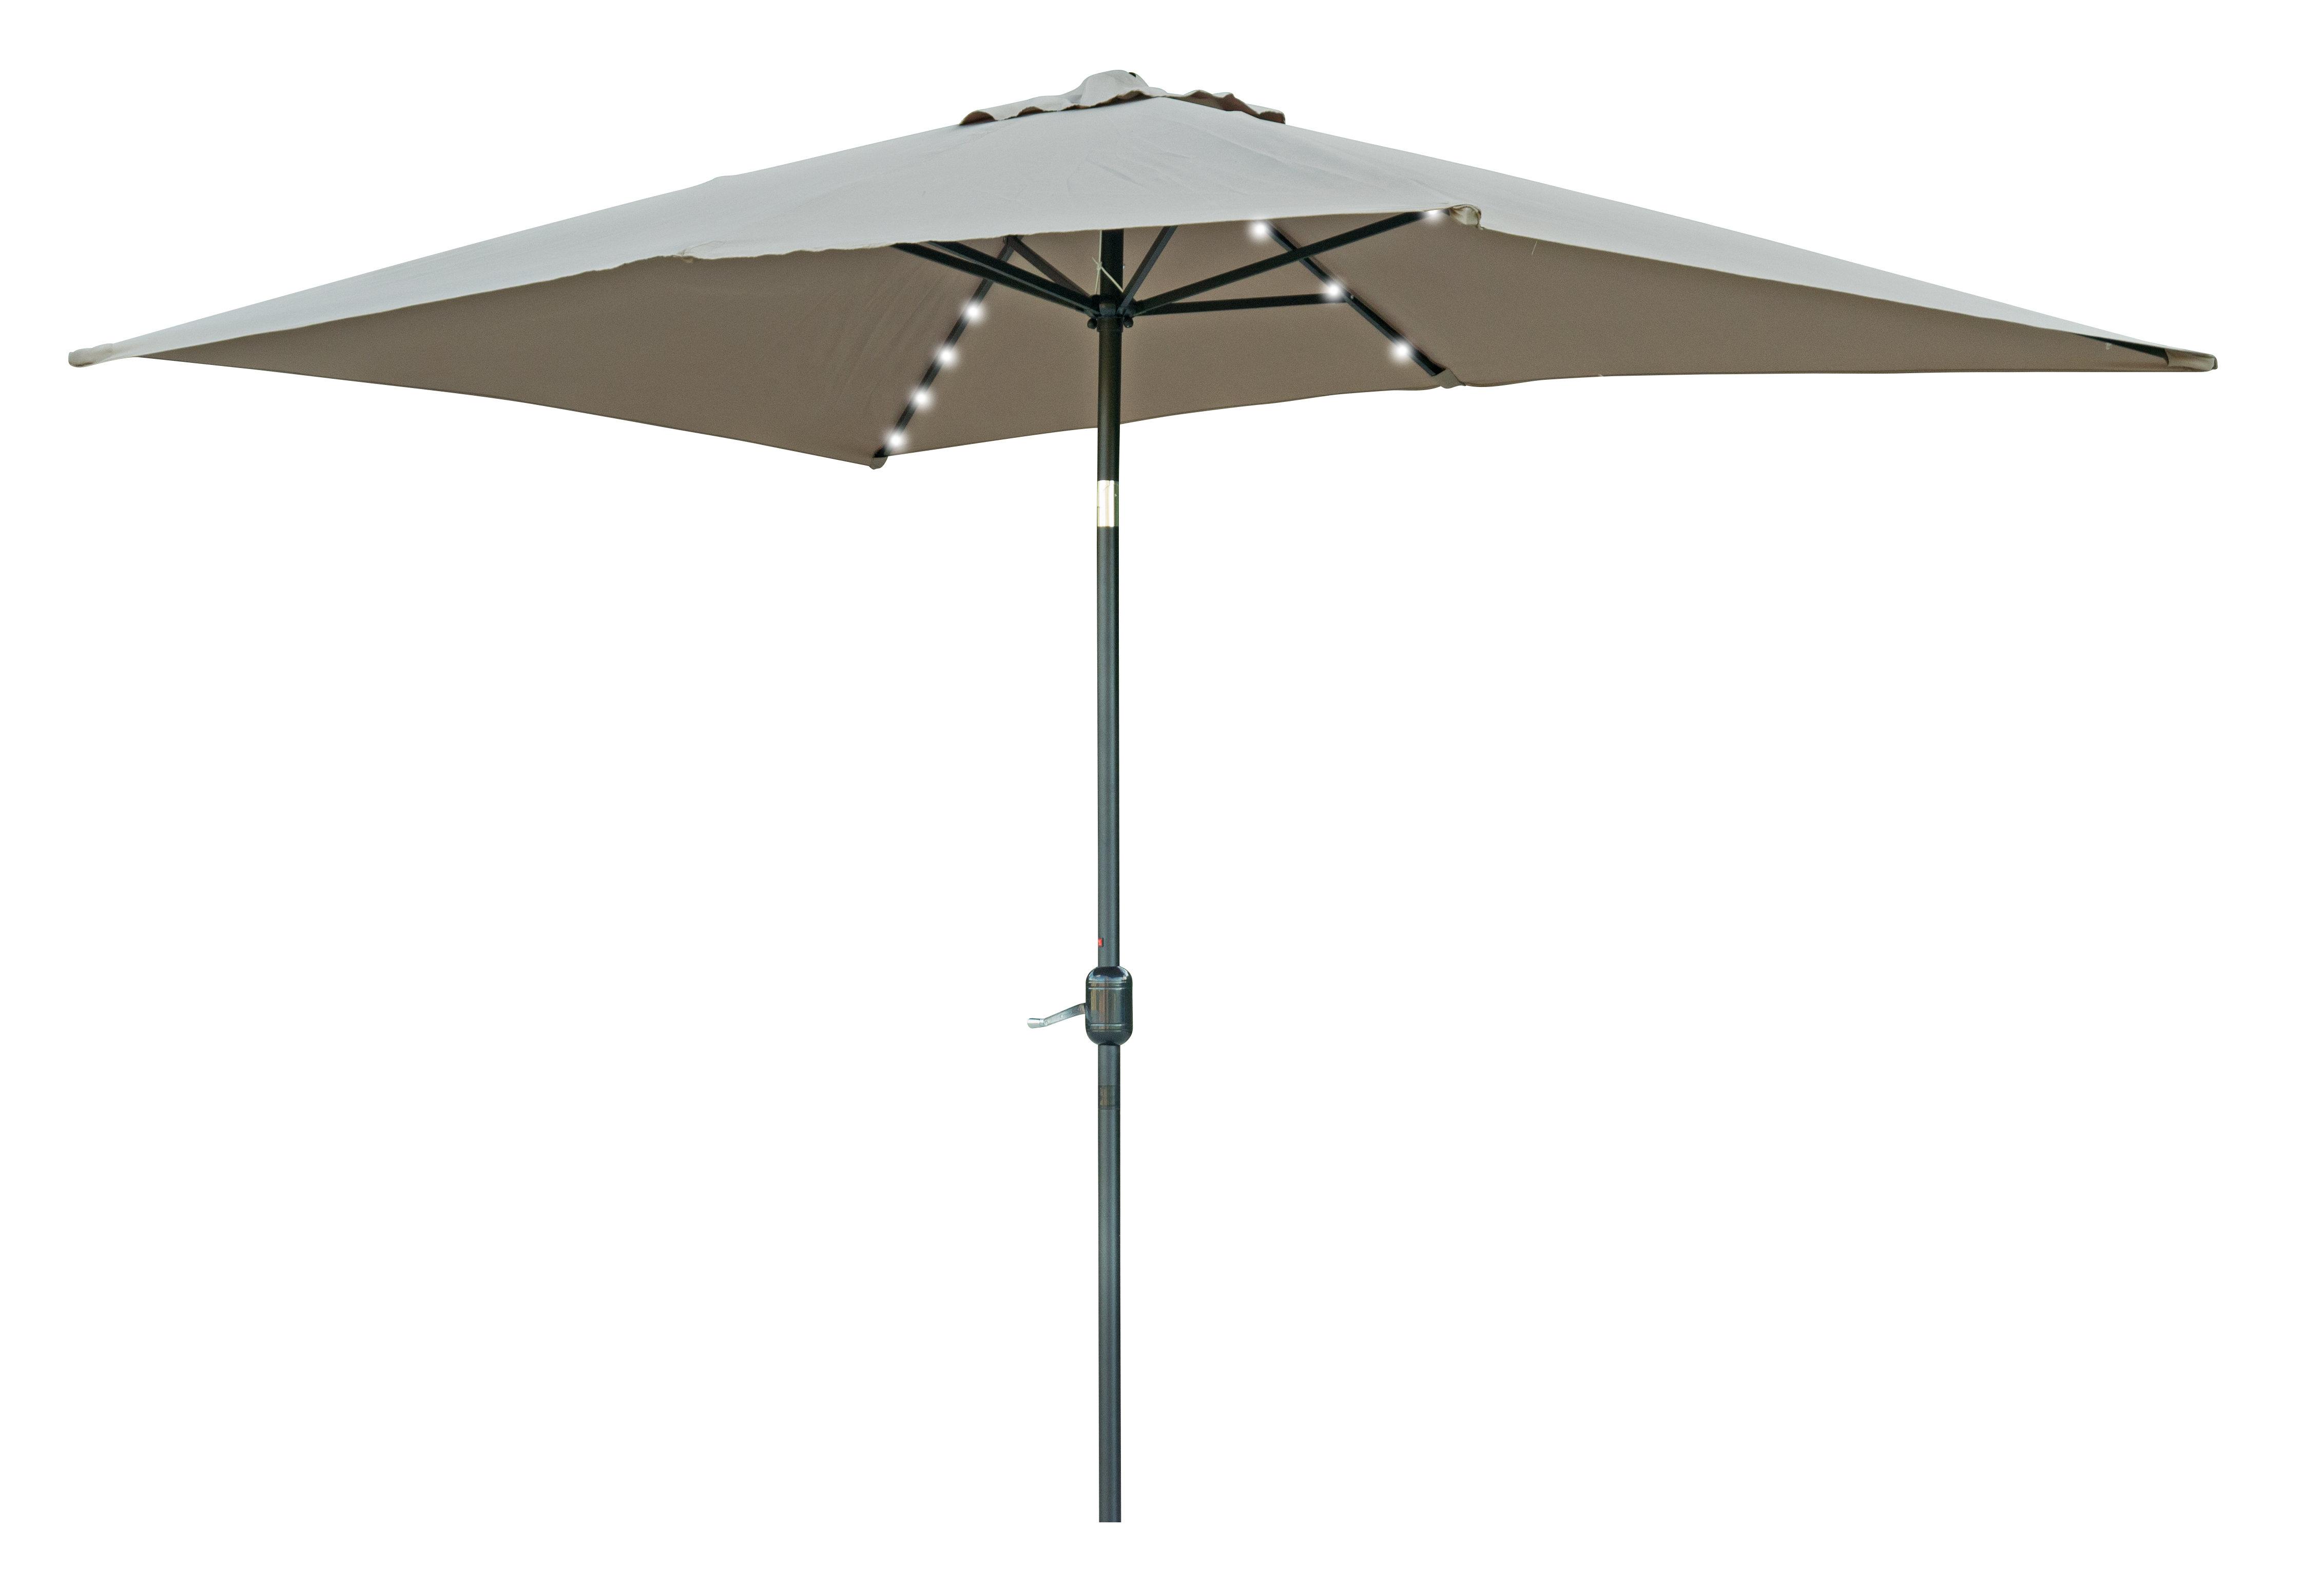 Bangert 10' X 6.5' Rectangular Lighted Umbrella Regarding Famous Fordbridge Rectangular Market Umbrellas (Gallery 11 of 20)